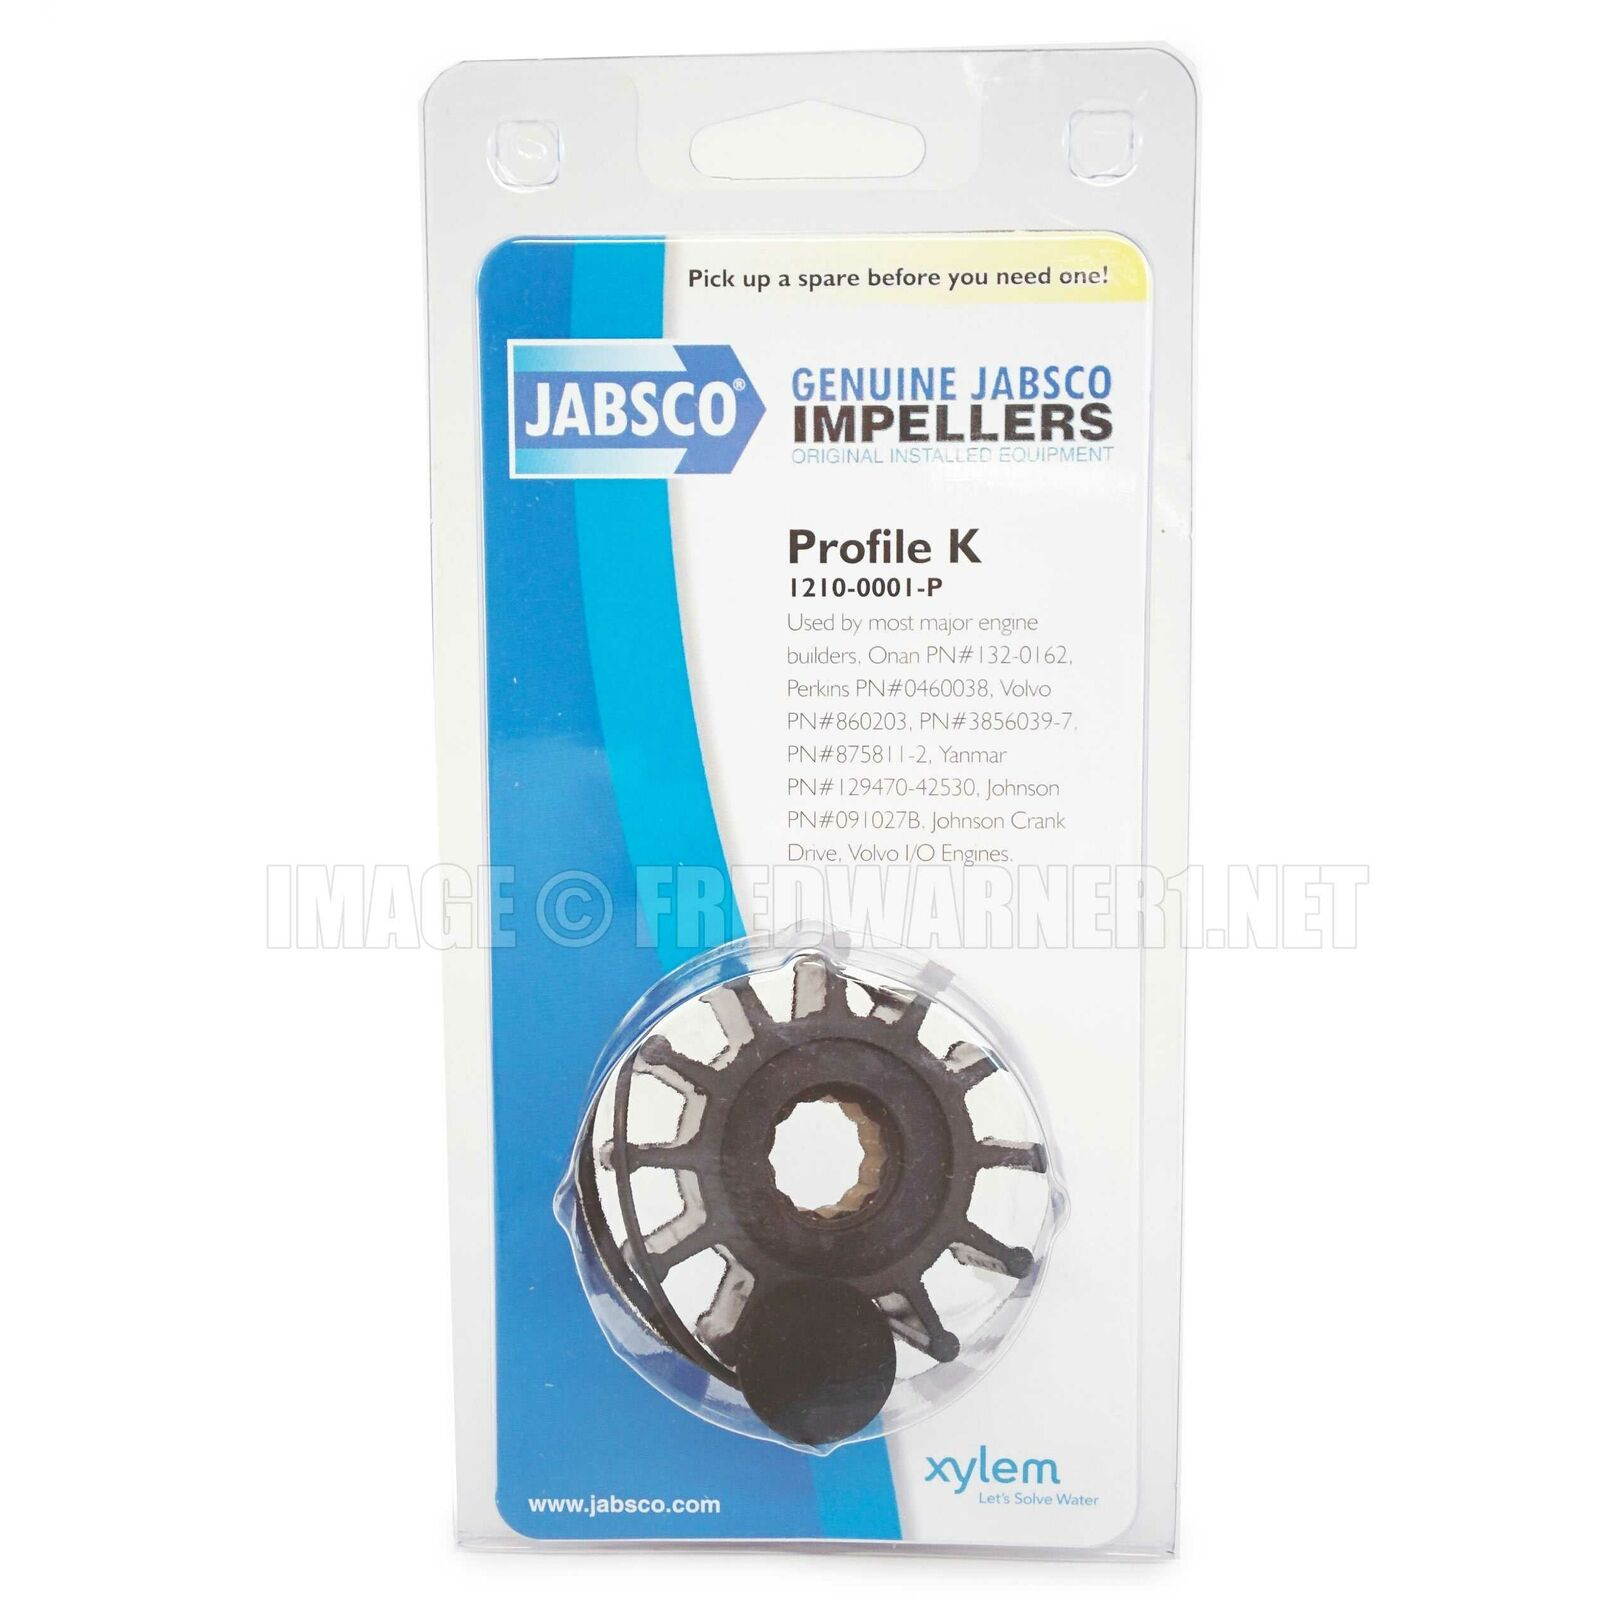 Jabsco Genuine 1210-0001-P Impeller /& Gasket Kit Perkins 0460038